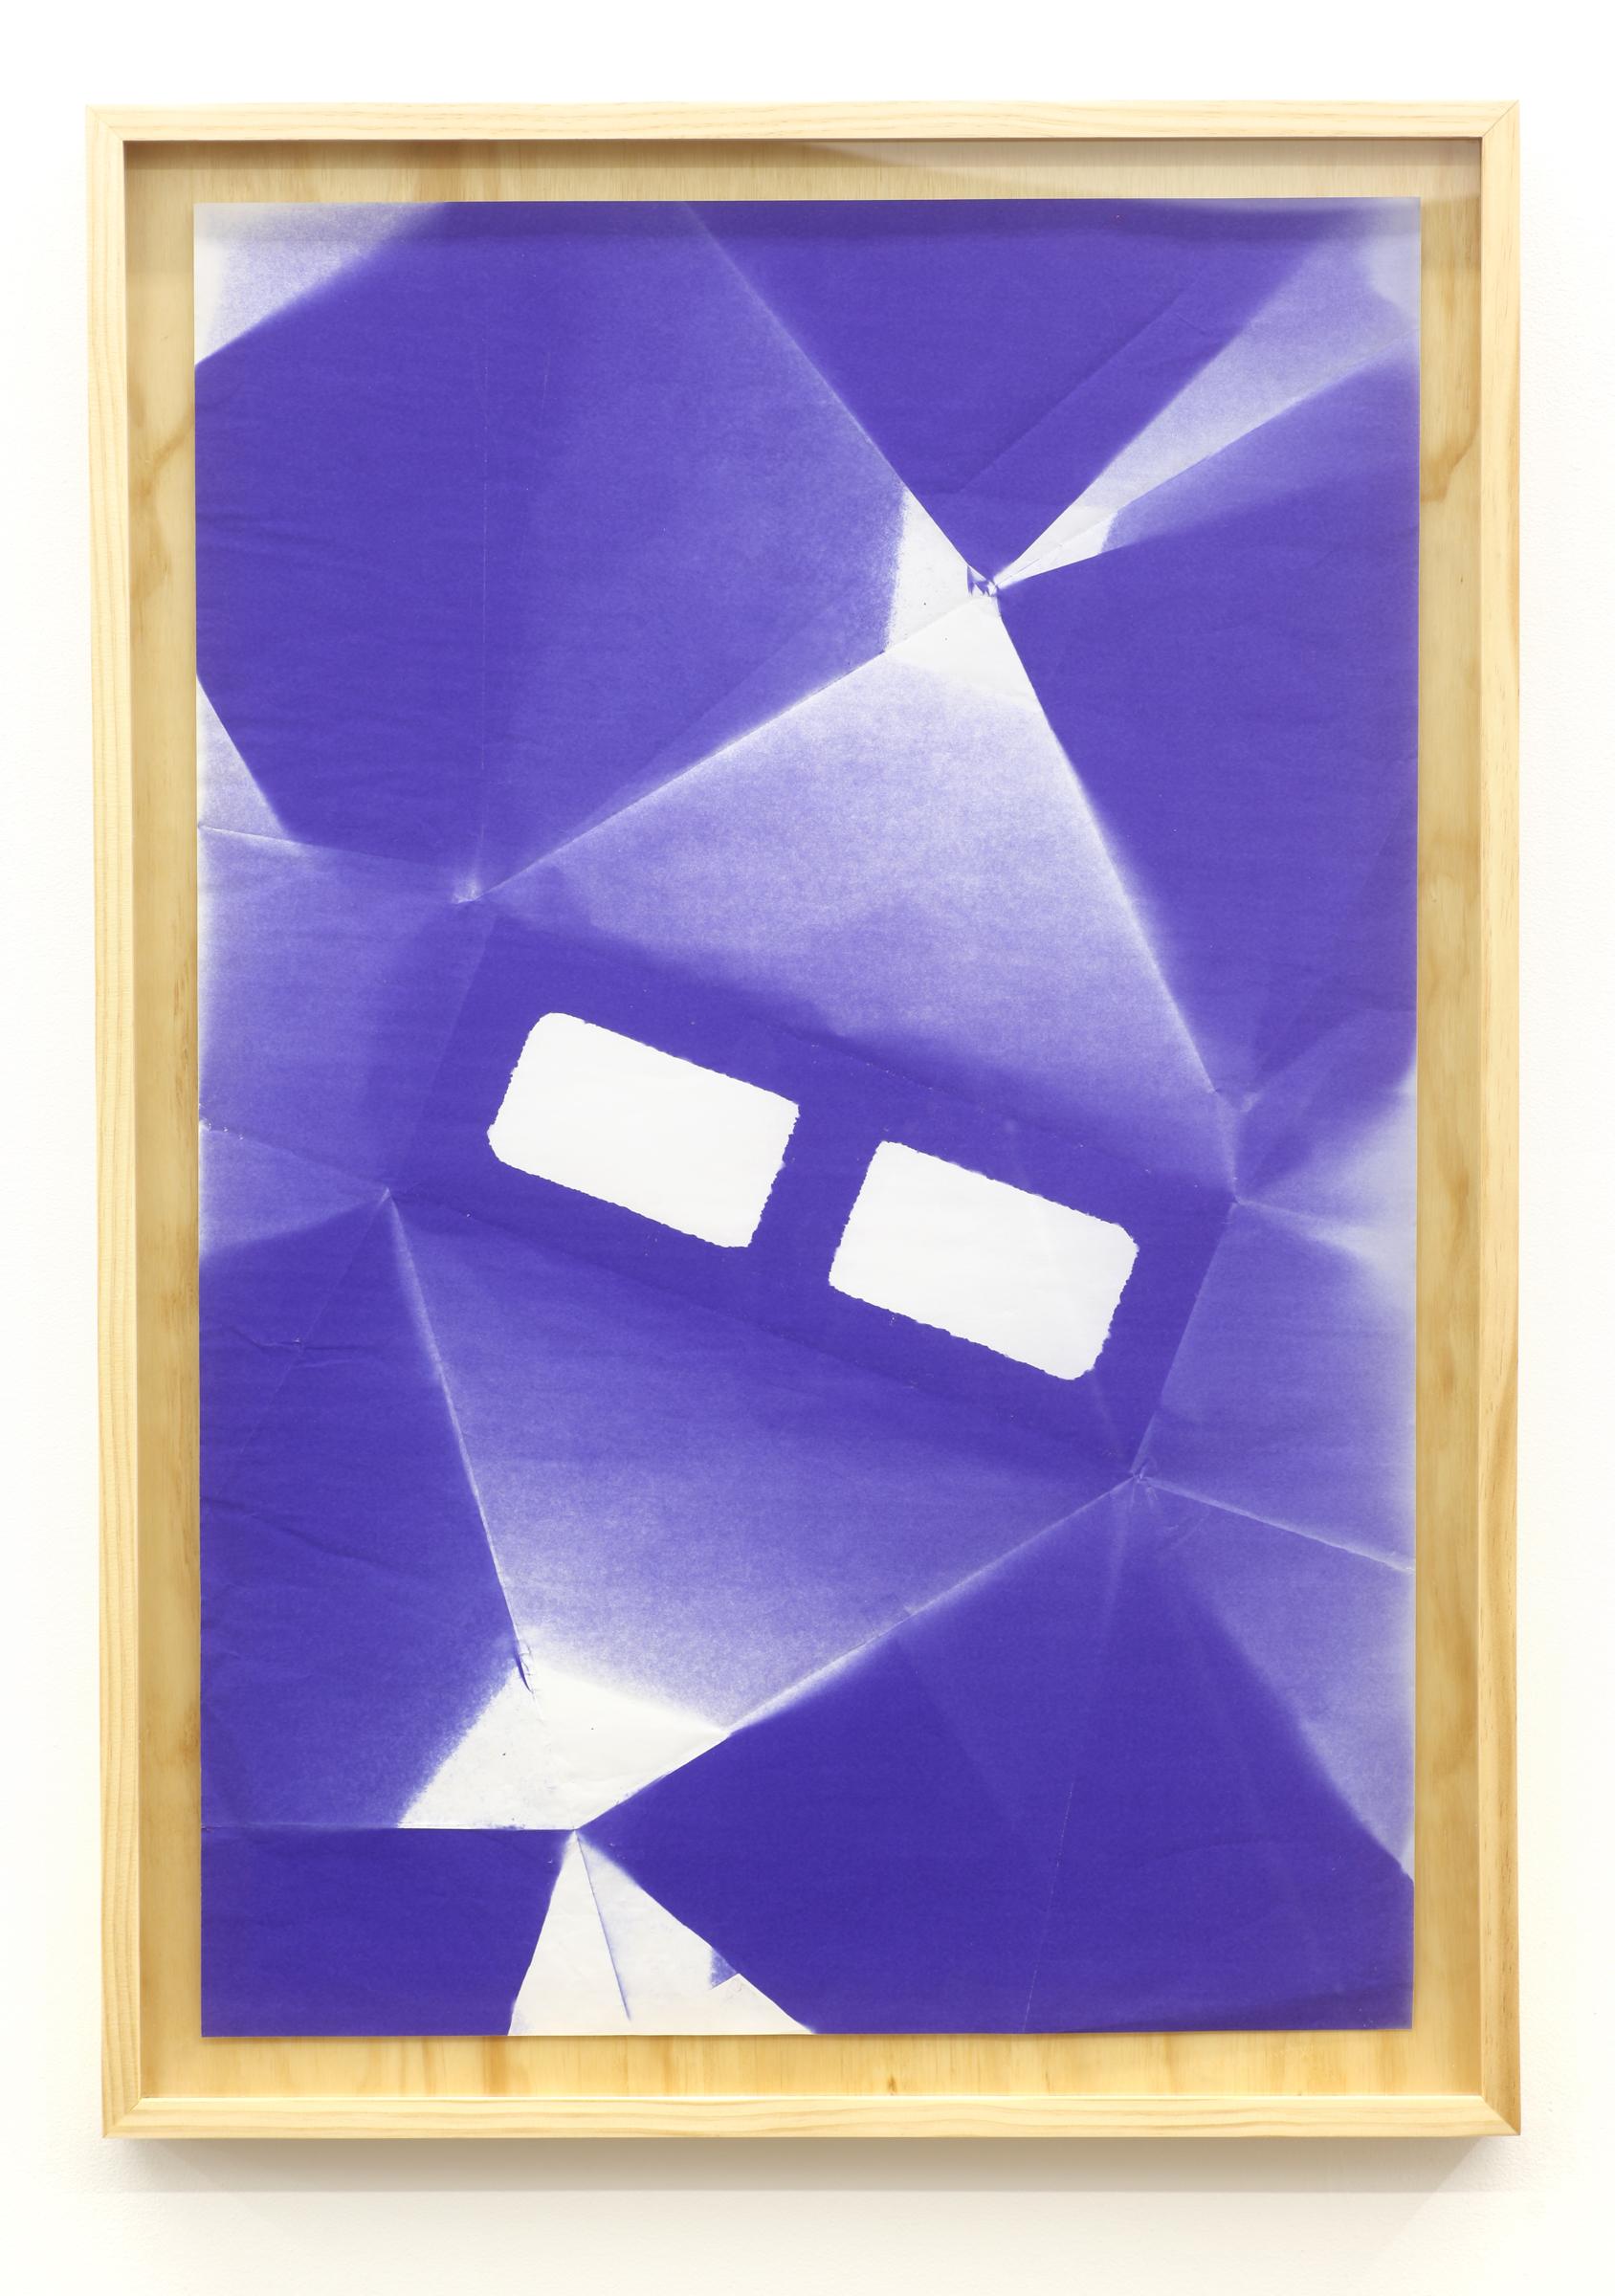 "WITH CINDER BLOCKS WE FLATTEN OUR PHOTOGRAPHS  Jonathan Runico, Untitled (C.M.U.) , Diazo blueprint and artist built custom plywood frame, 40"" x 28"" x 3"", 2013"